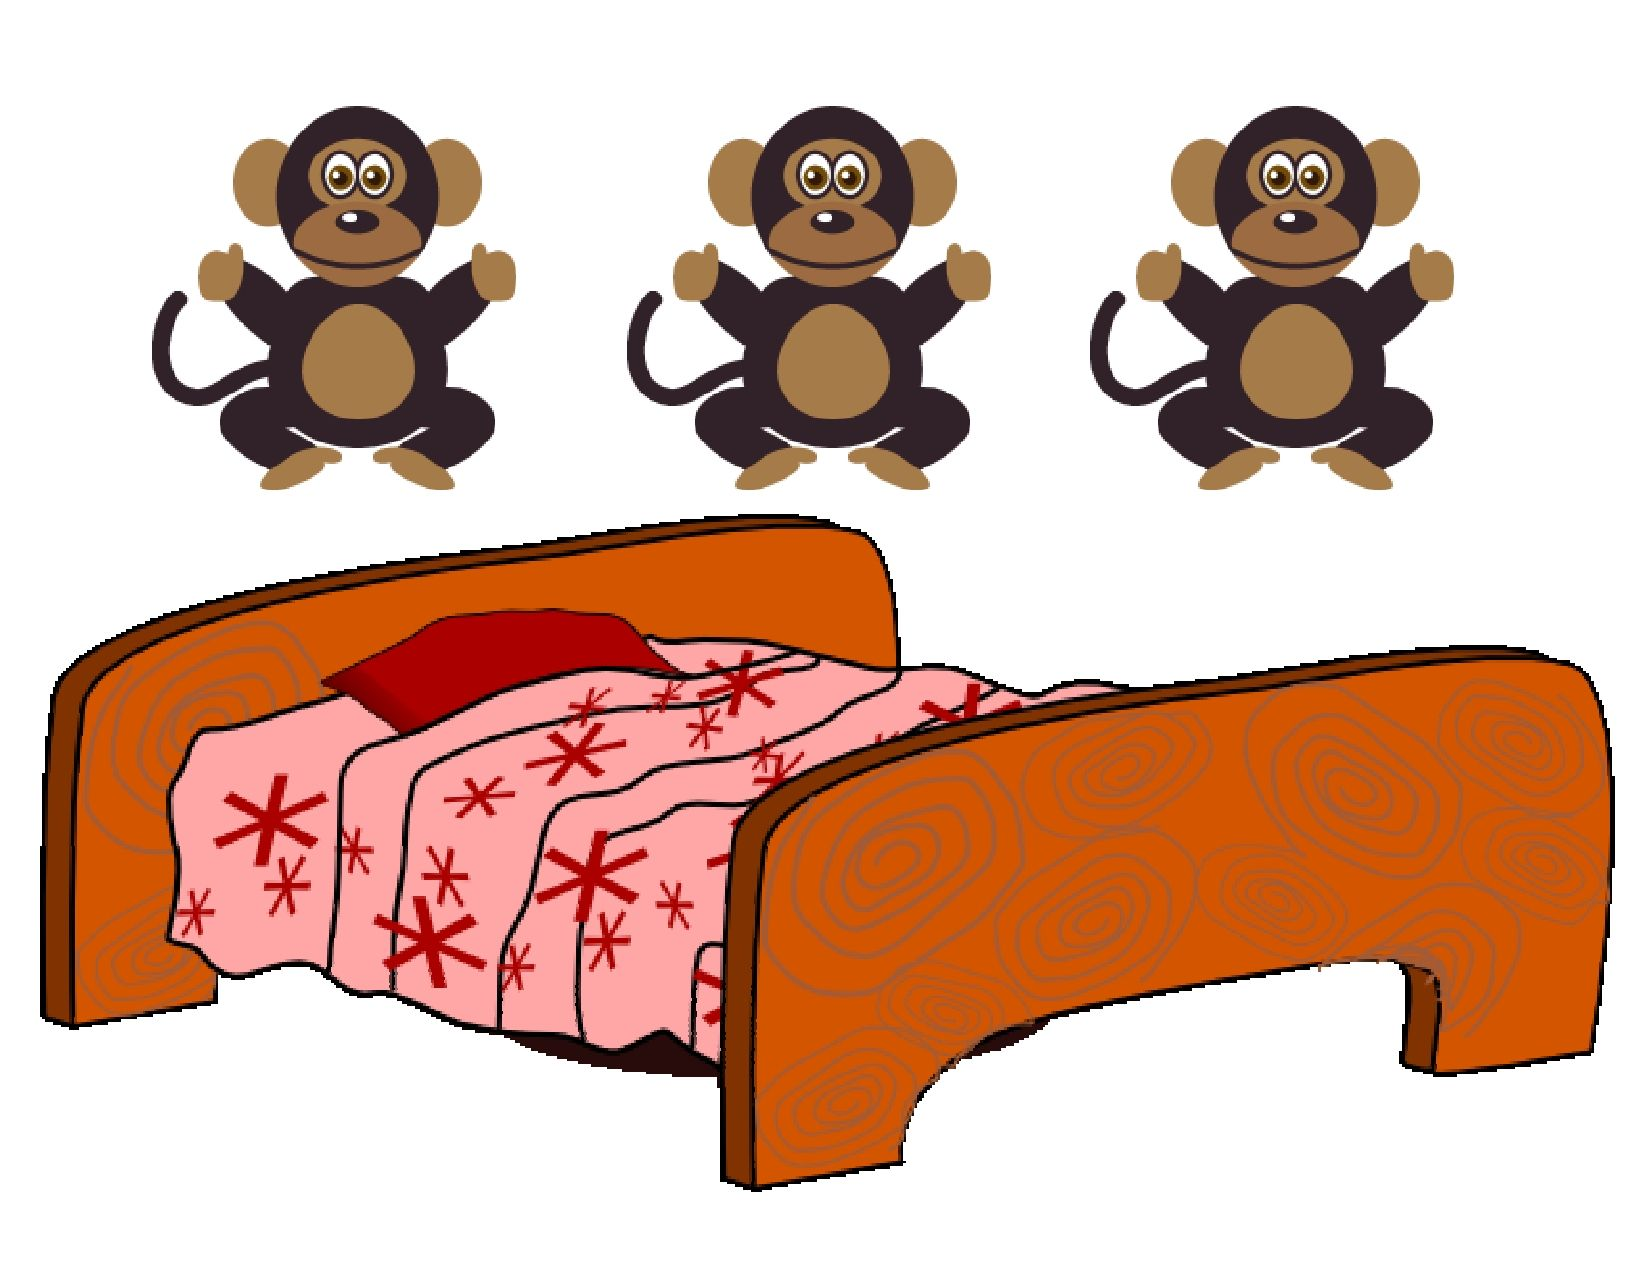 Five Little Monkeys Jumping On A Bed Is A Favorite Fingerplay For Preschoolers To Begin Learning